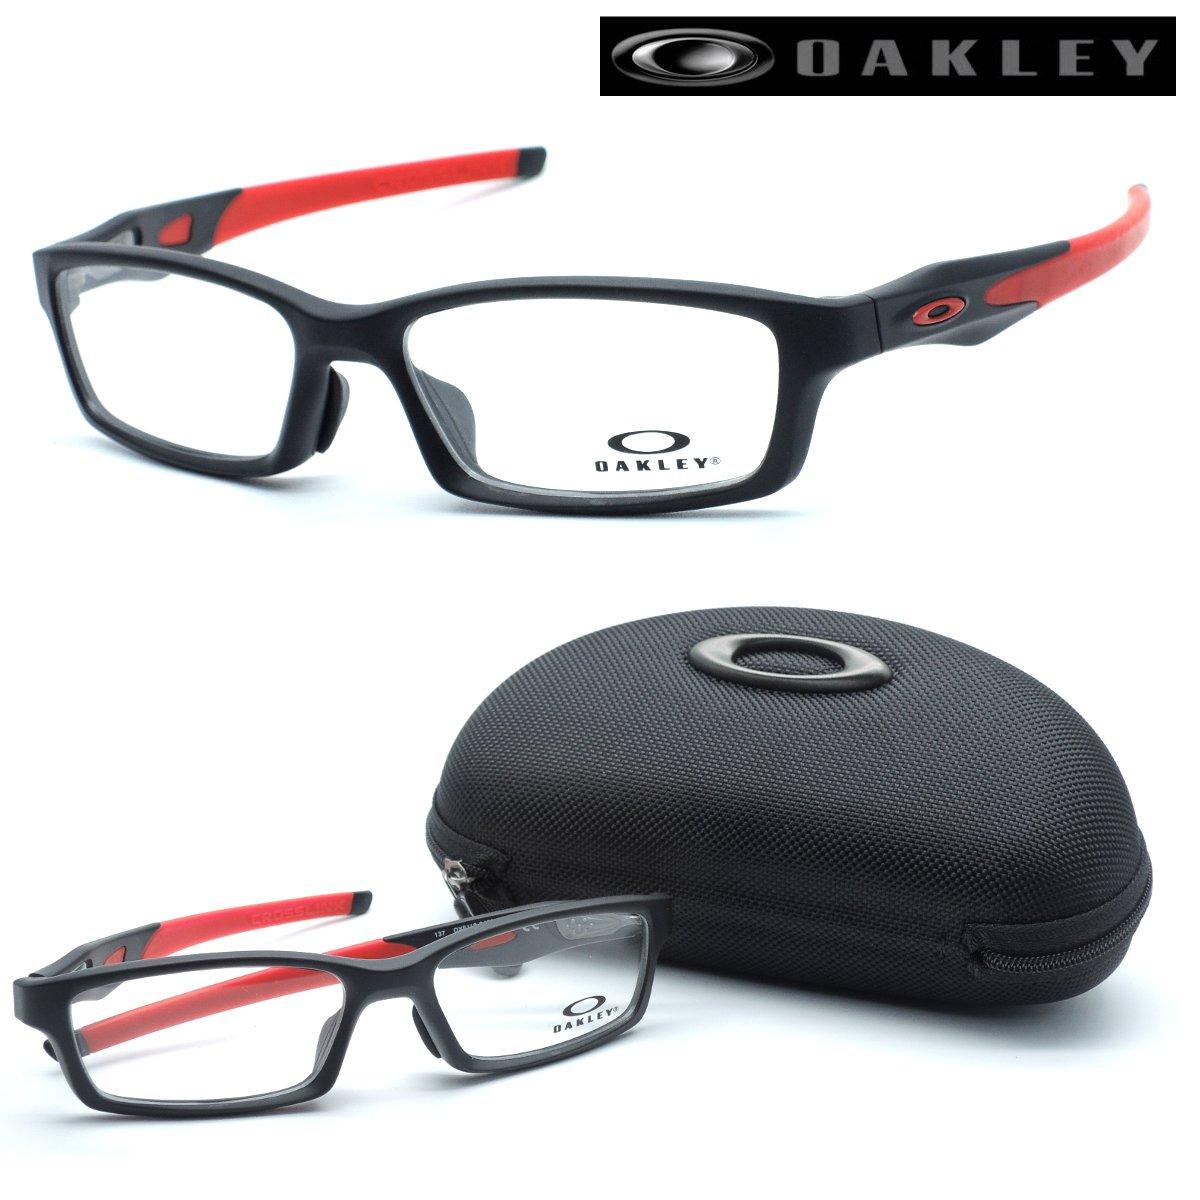 【OAKLEY】 (オークリー) メガネ ox8118-0456 CROSSLINK ASIA FIT クロスリンク アジアフィット スクエア OAKLEY 度付又は度無レンズセット 【正規品】【店内全品送料無料】メンズ レディース ユニセックス